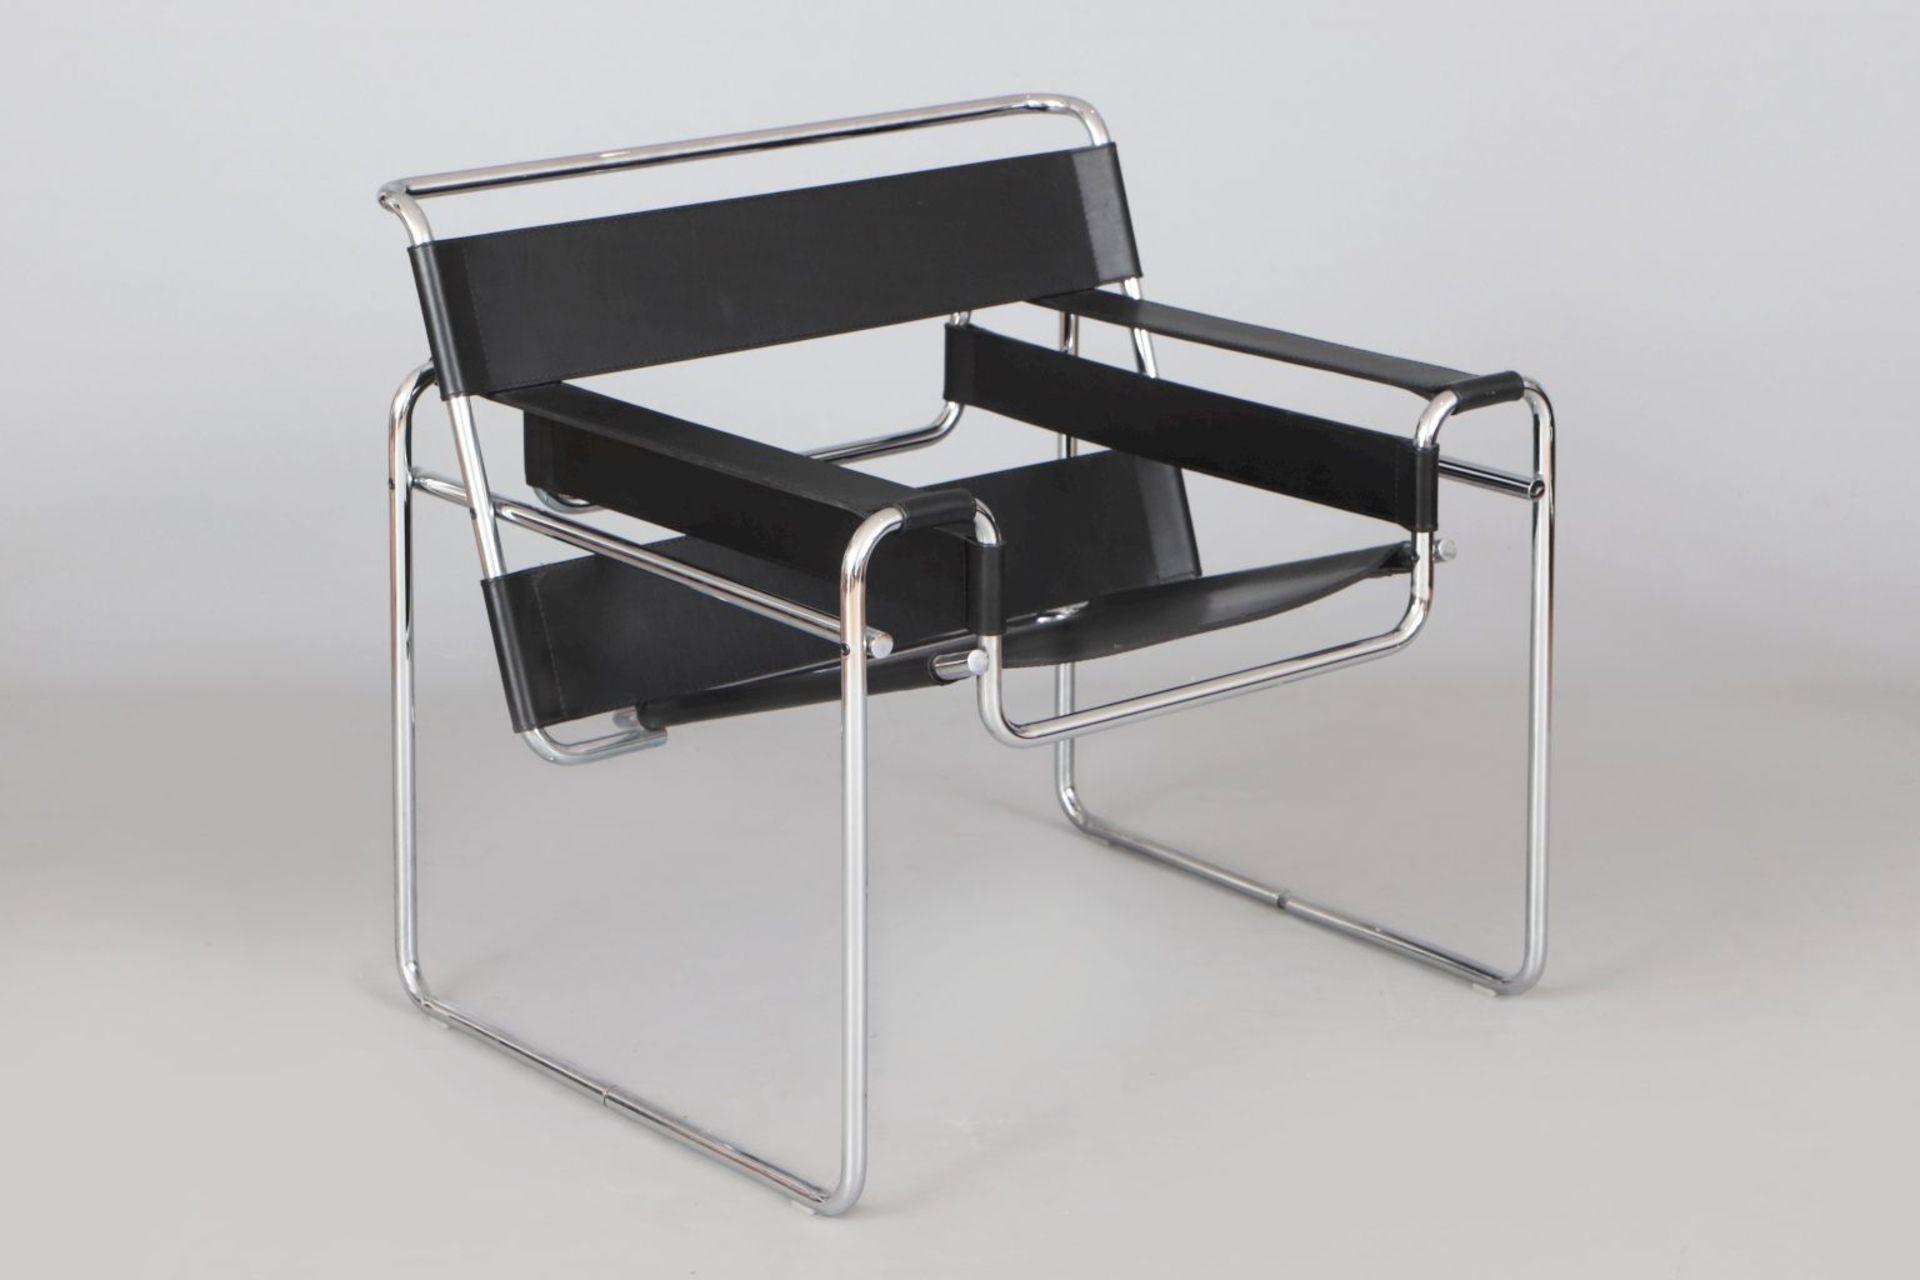 MARCEL BREUER ¨Wassily Chair¨